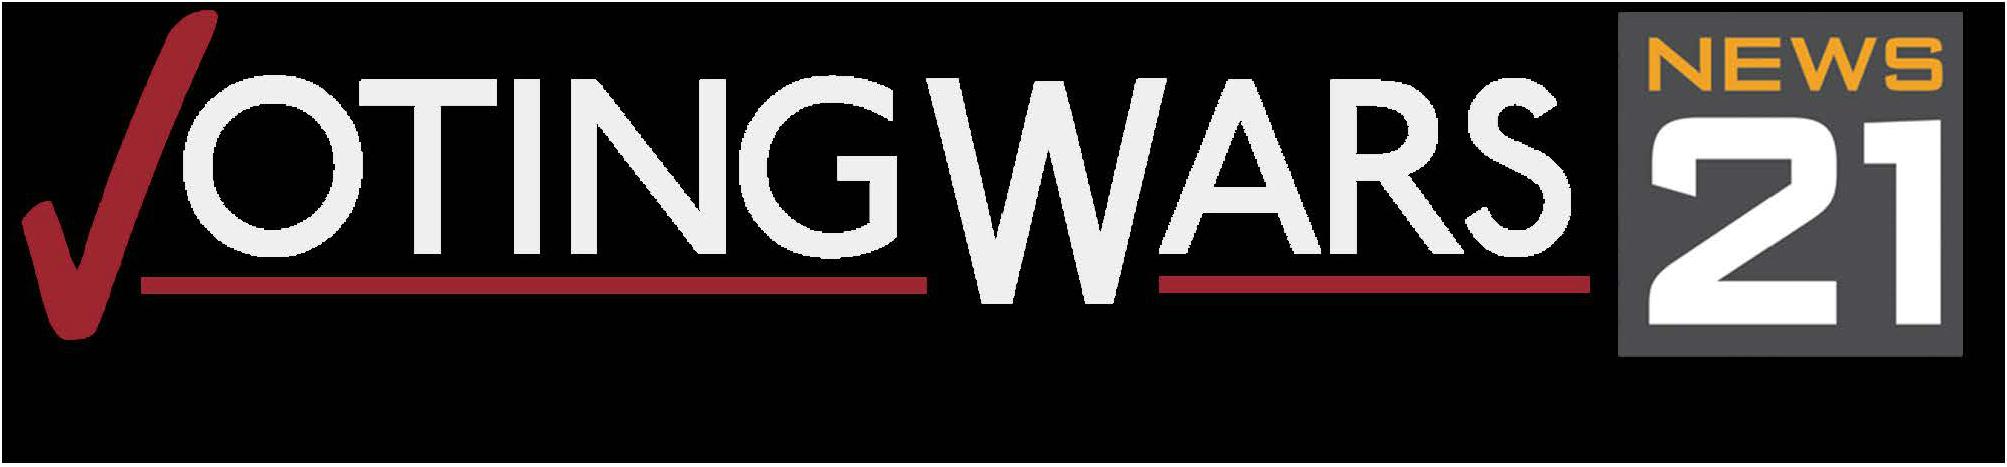 Voting Wars logo